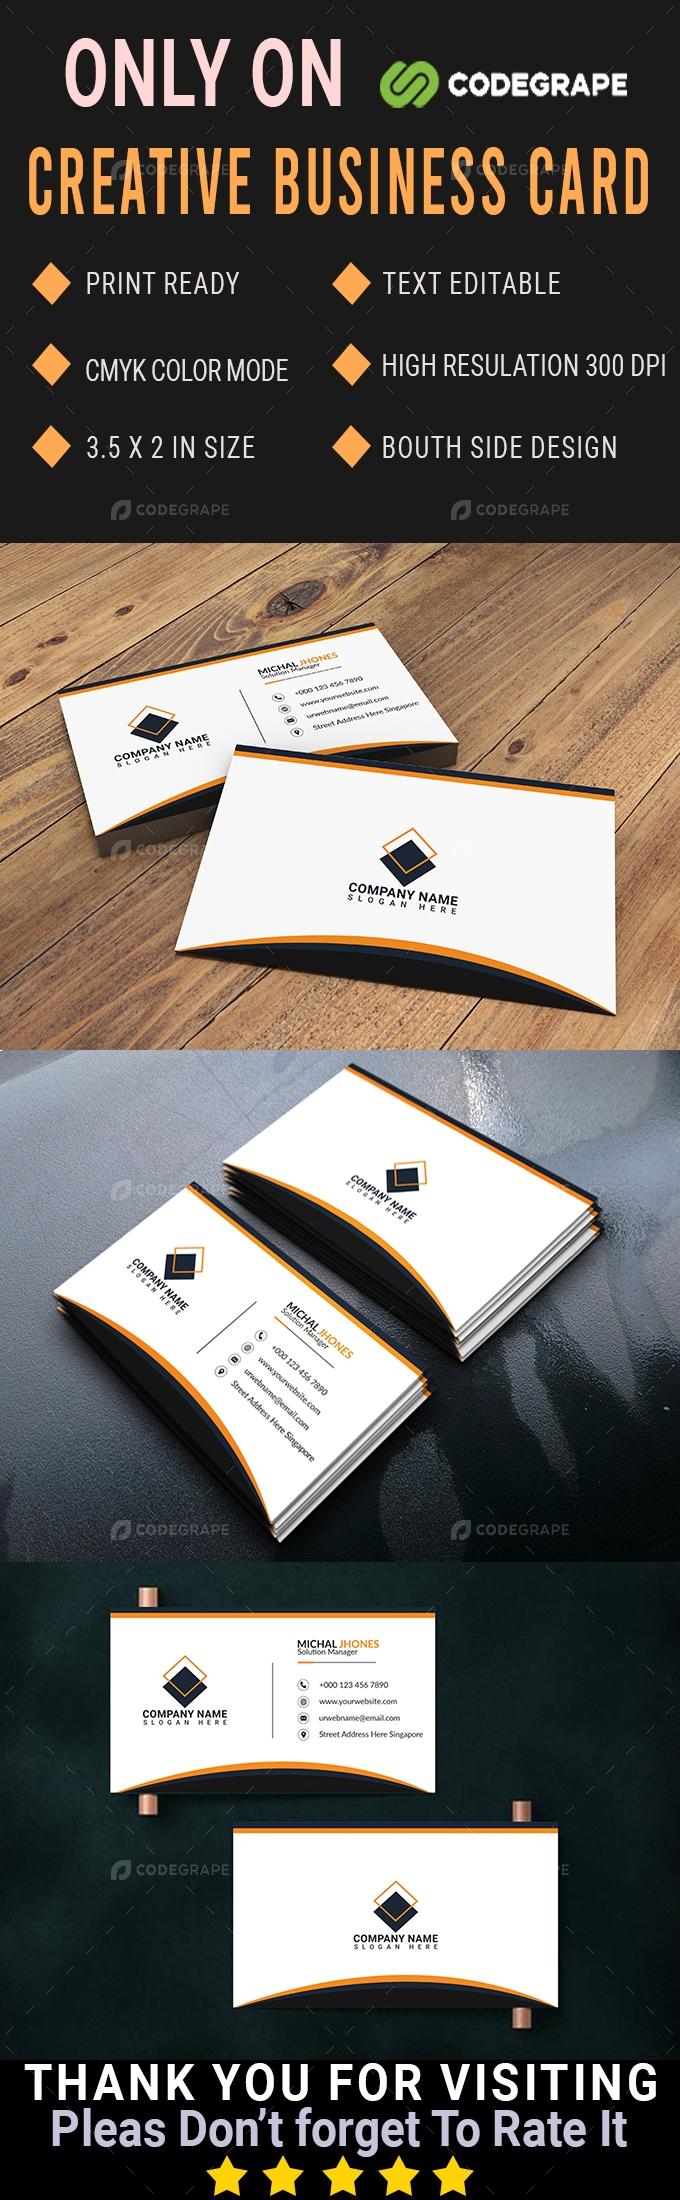 Unique & Creative Business Card